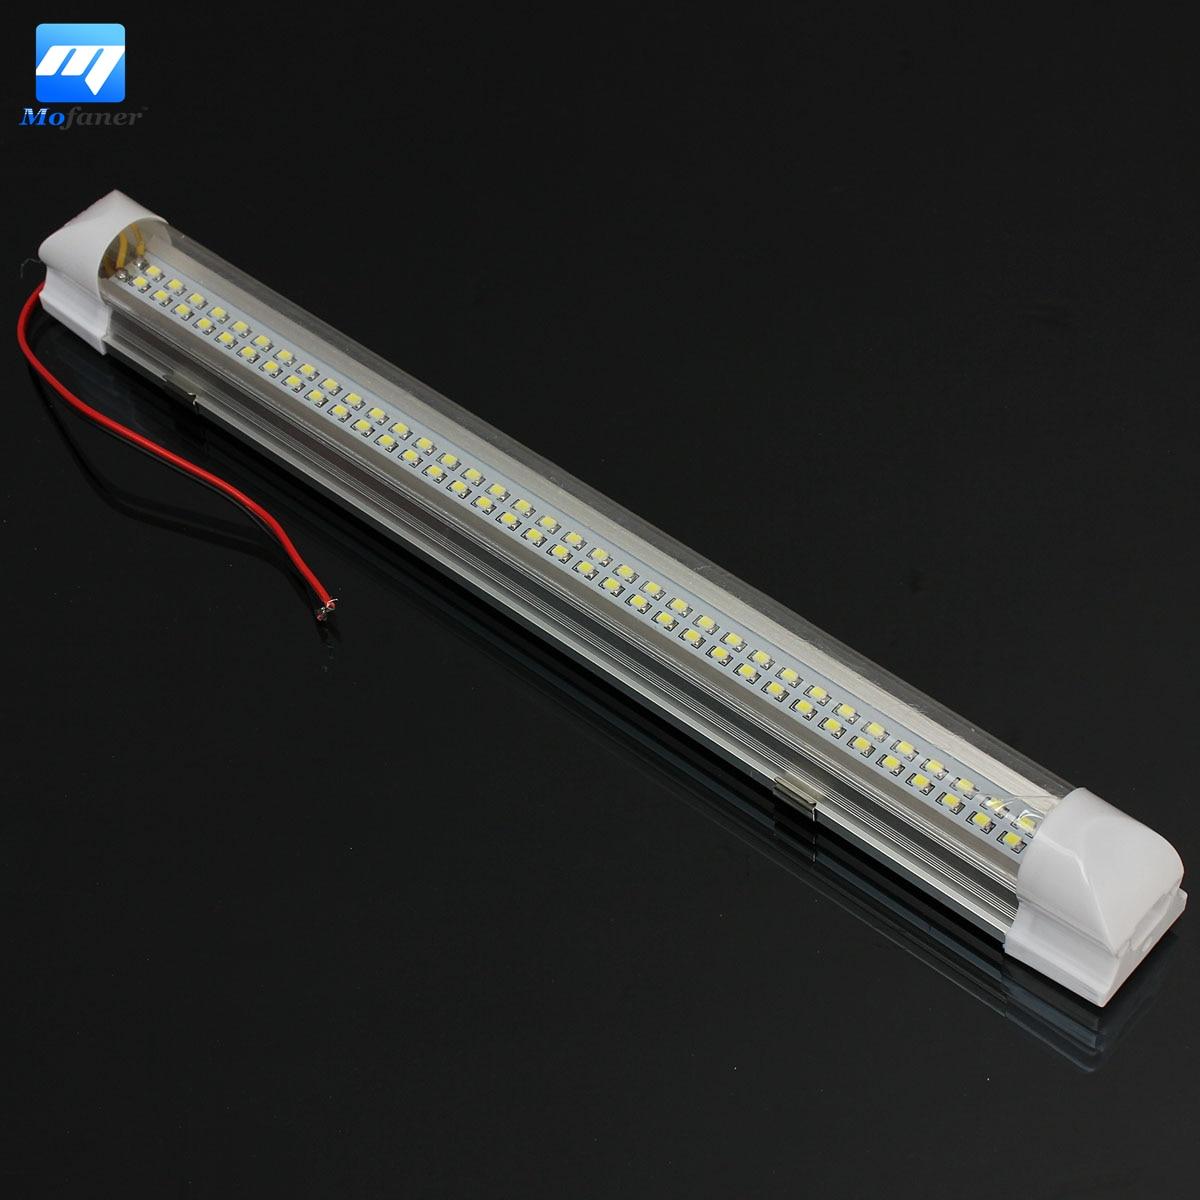 New 12V Universal Car Auto Caravan Interior 72 LED White Light Strip Bar 340MM Lamp ON/OFF Switch